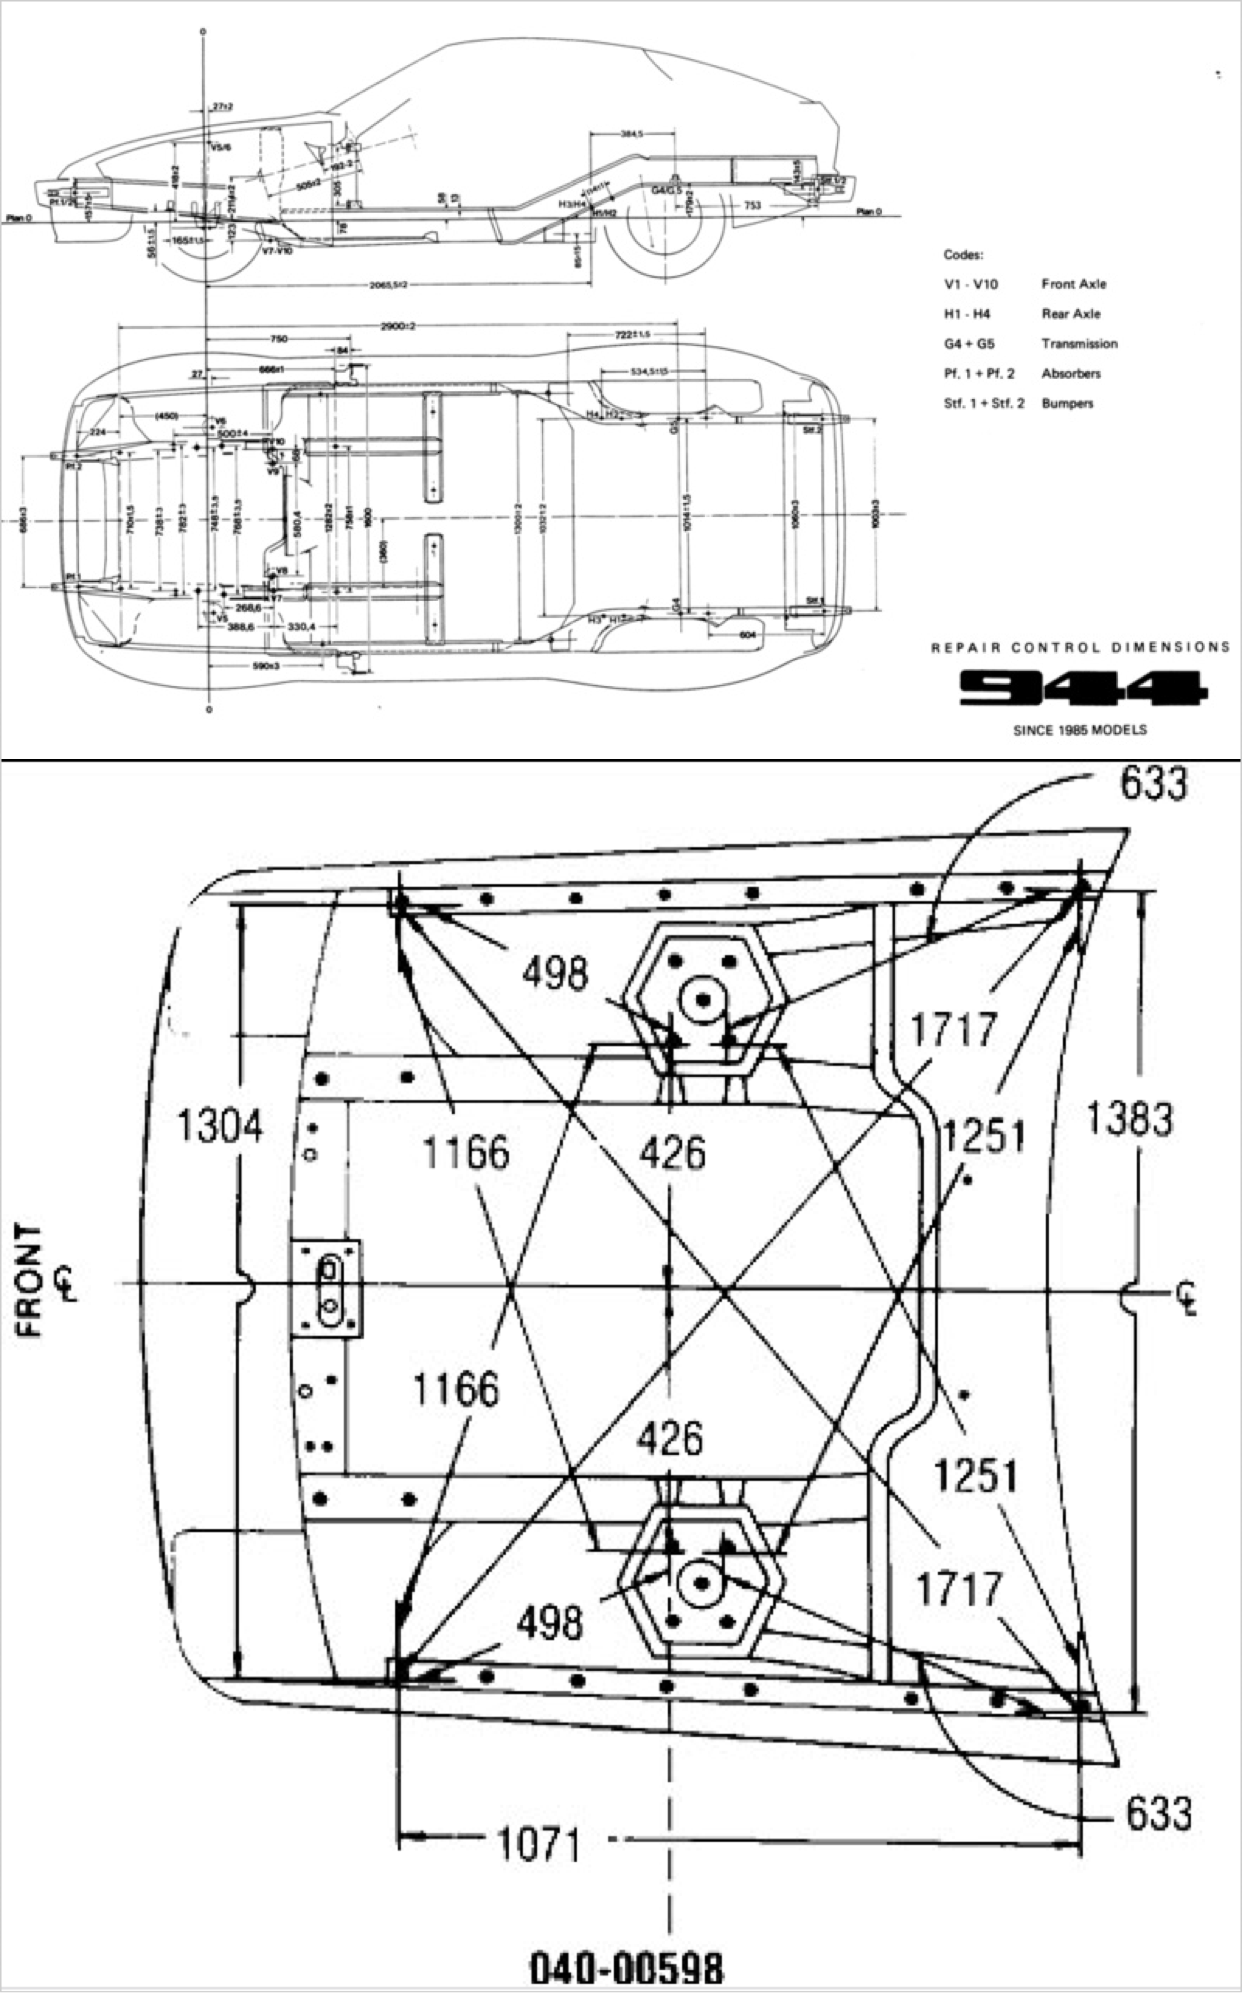 Porsche 944 Repair Control Dimensions Front Detail With Images